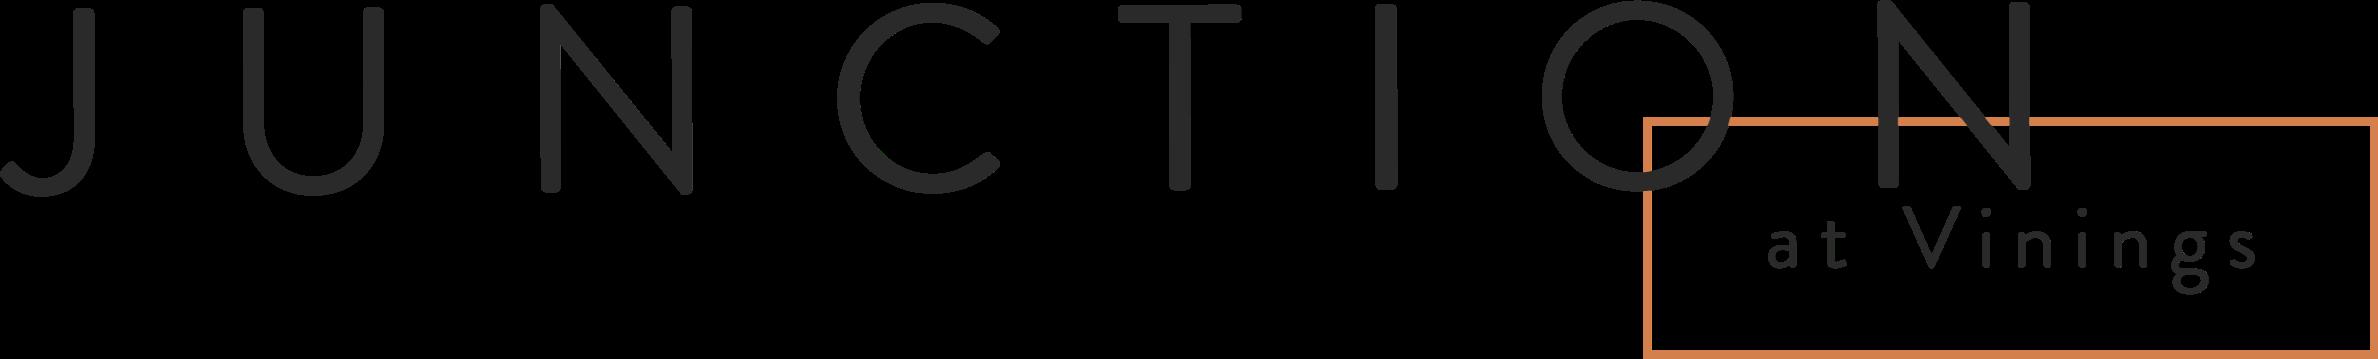 Junction at Vinings Logo